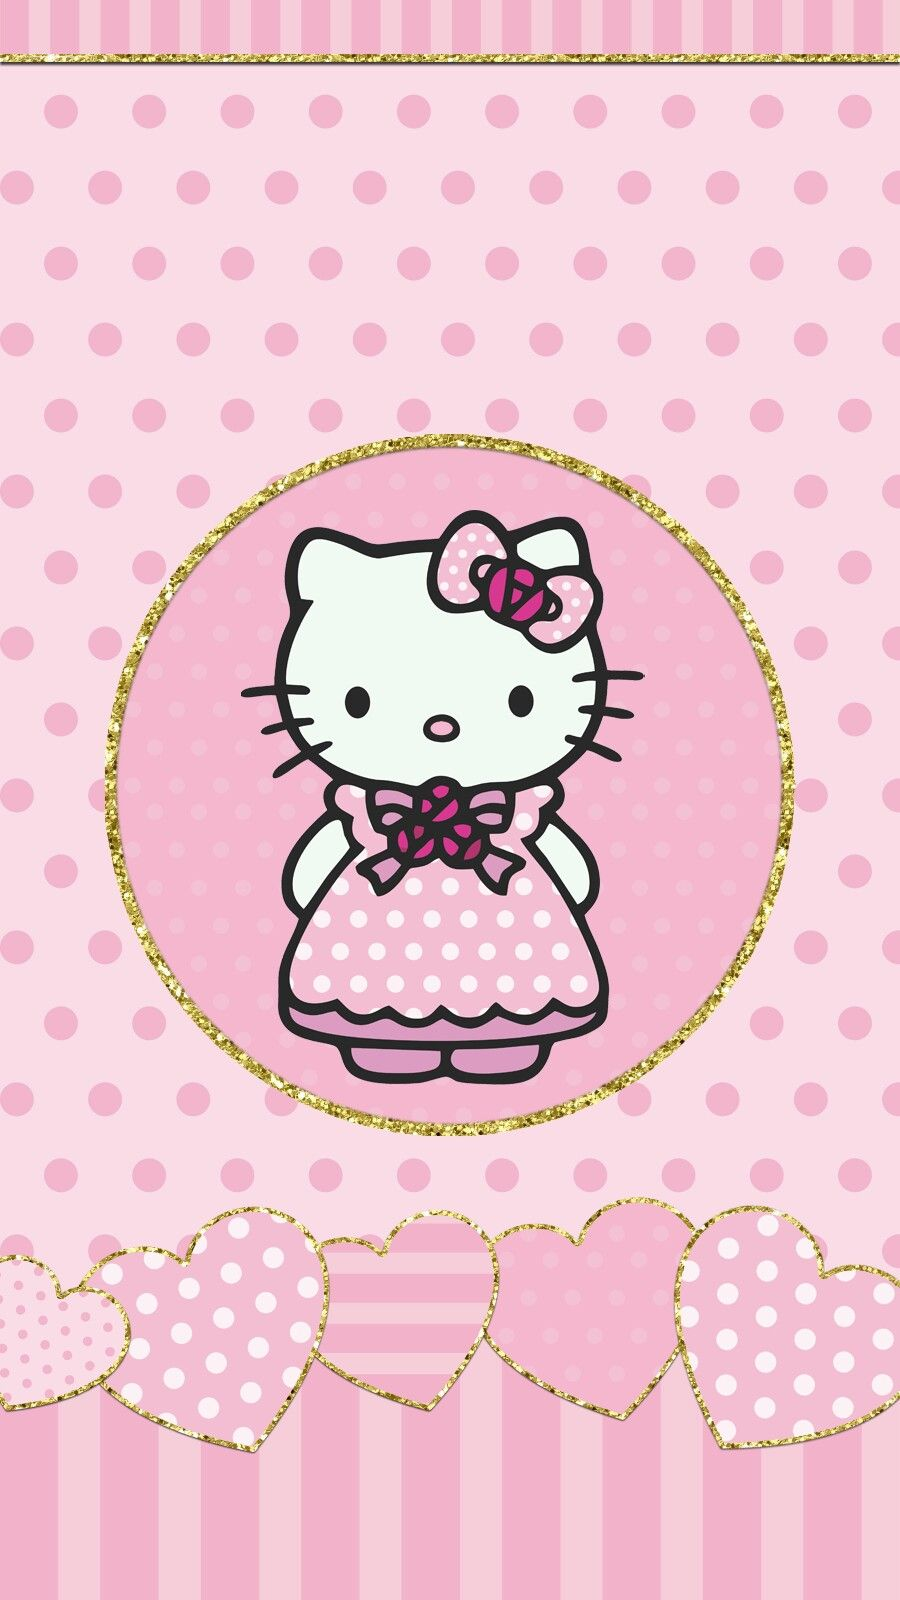 Hello kitty princess pink wallpaper android iphone - Princesse hello kitty ...